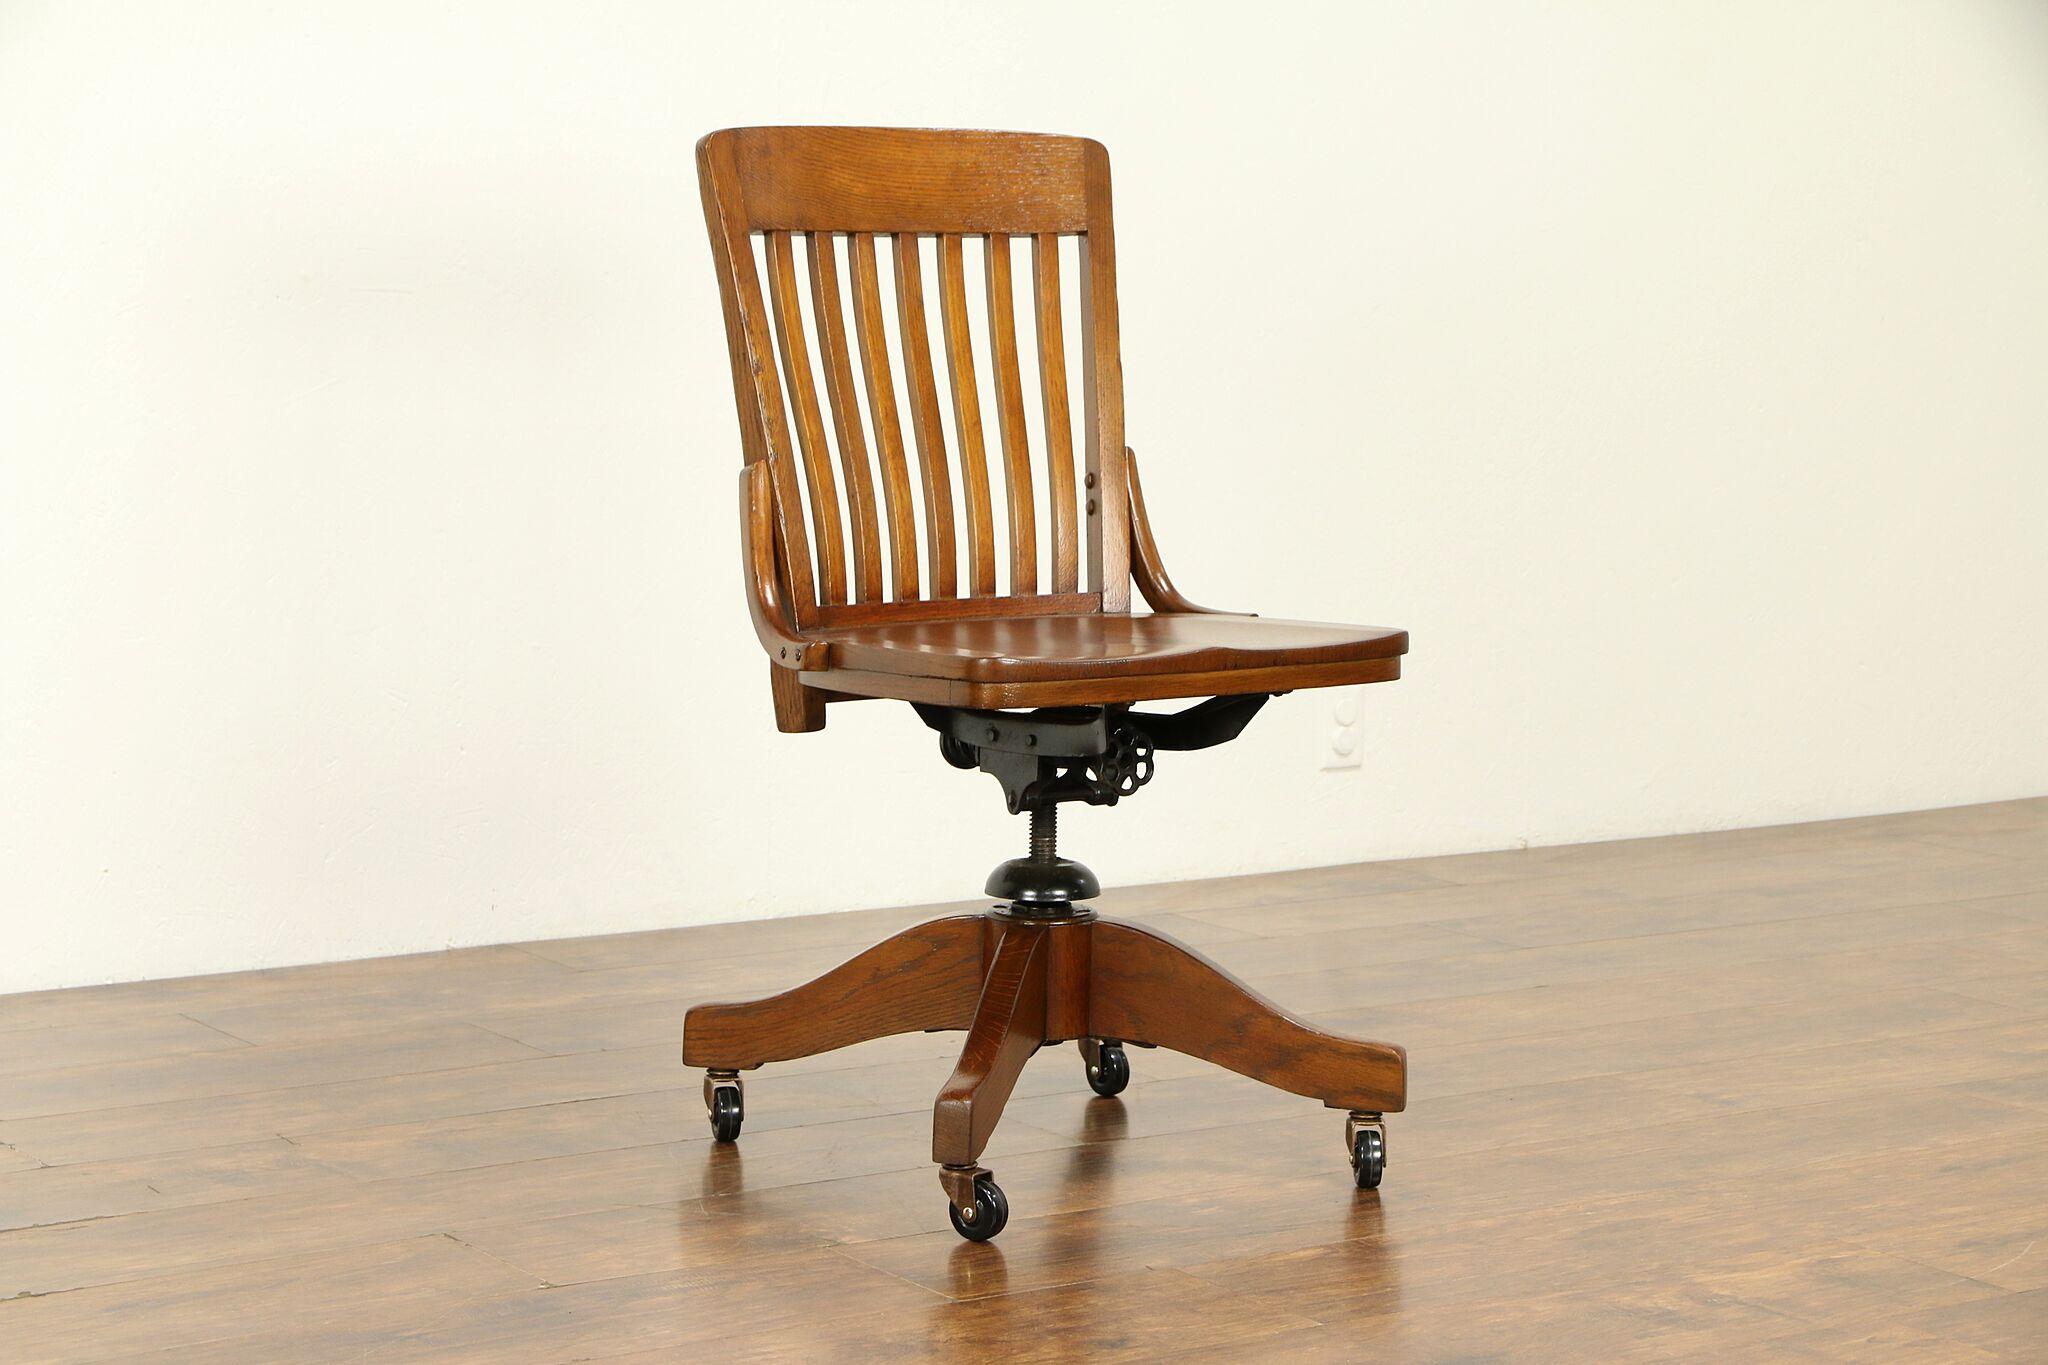 Phenomenal Oak Quarter Sawn Antique Swivel Adjustable Desk Chair 32065 Forskolin Free Trial Chair Design Images Forskolin Free Trialorg